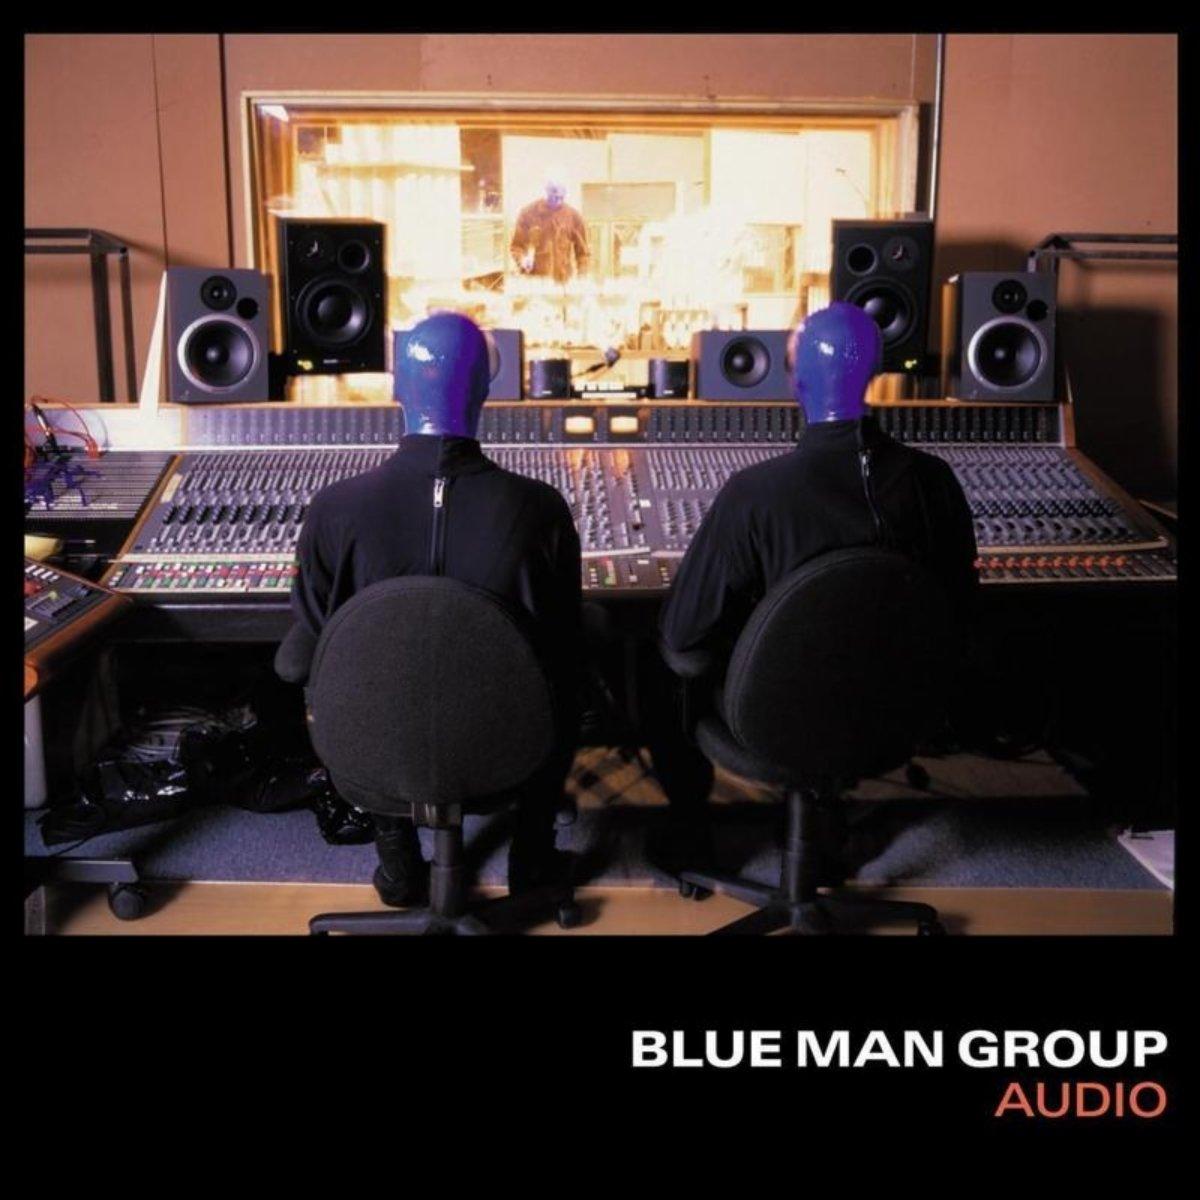 Blue Man Group-Audio-CD-FLAC-1999-FLACME